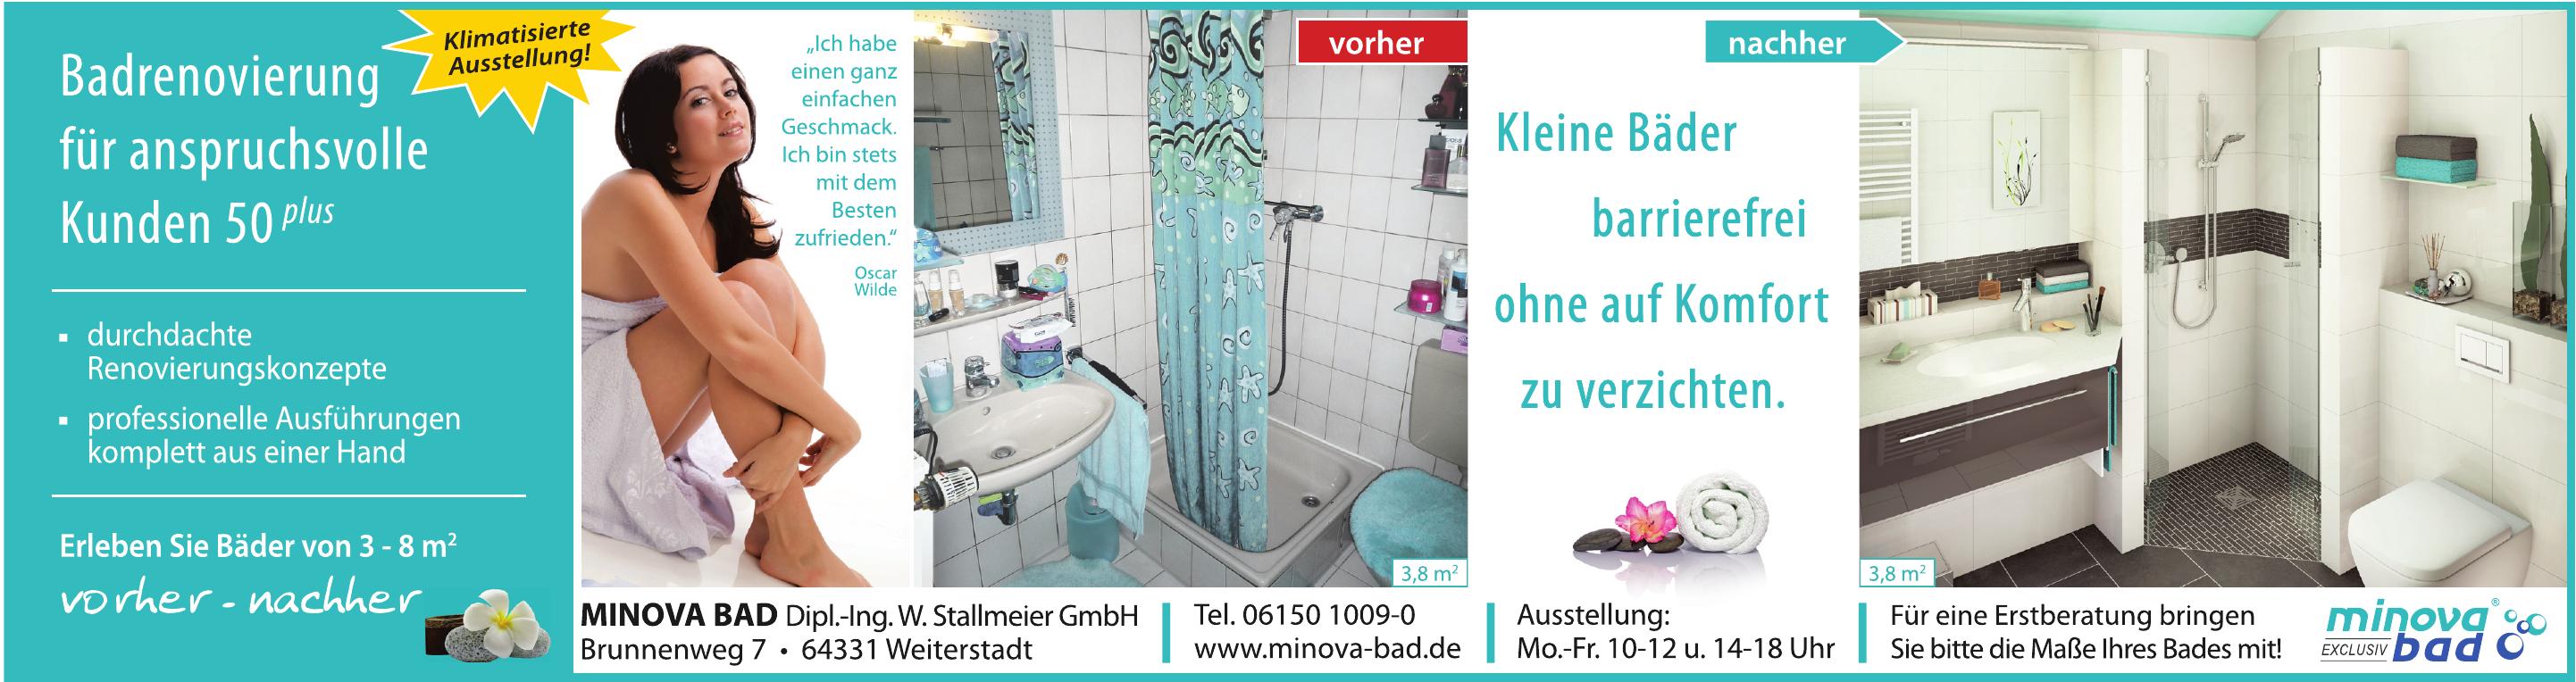 Minova Bad Dipl.-Ing. W. Stallmeier GmbH